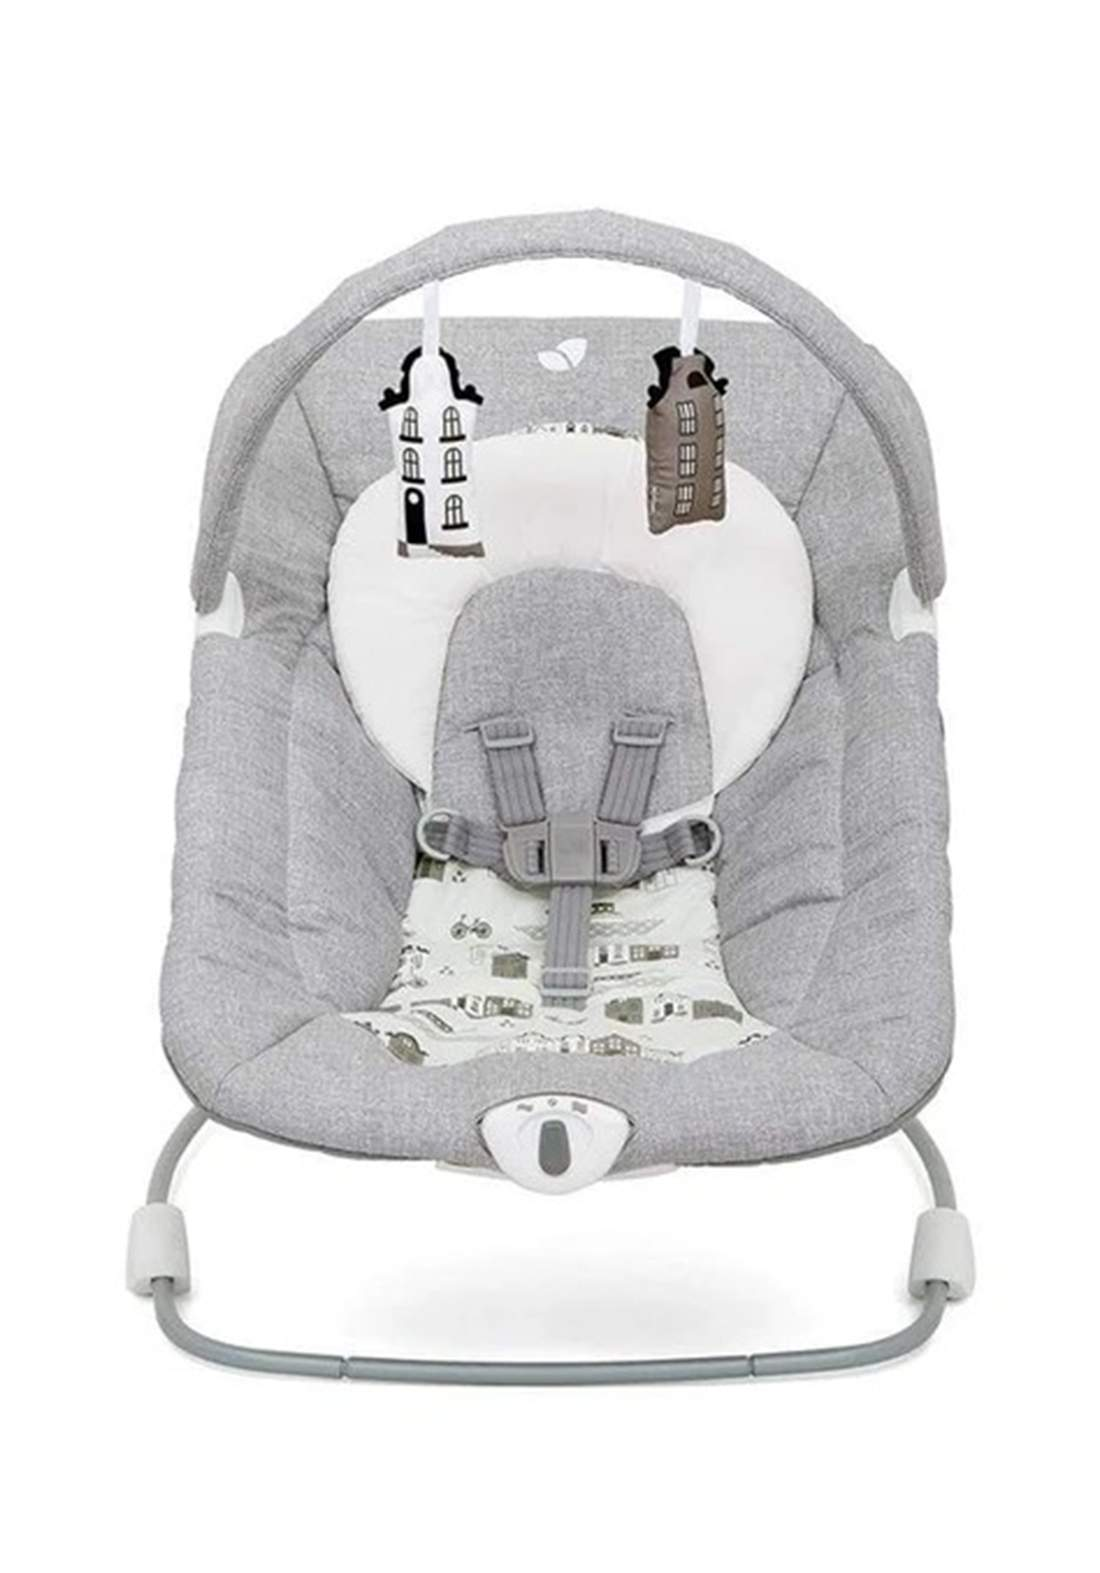 كرسي هزاز للاطفال 3.6 كغم Joie Baby B1707AAPTC000 Wish Bouncer - Petite City